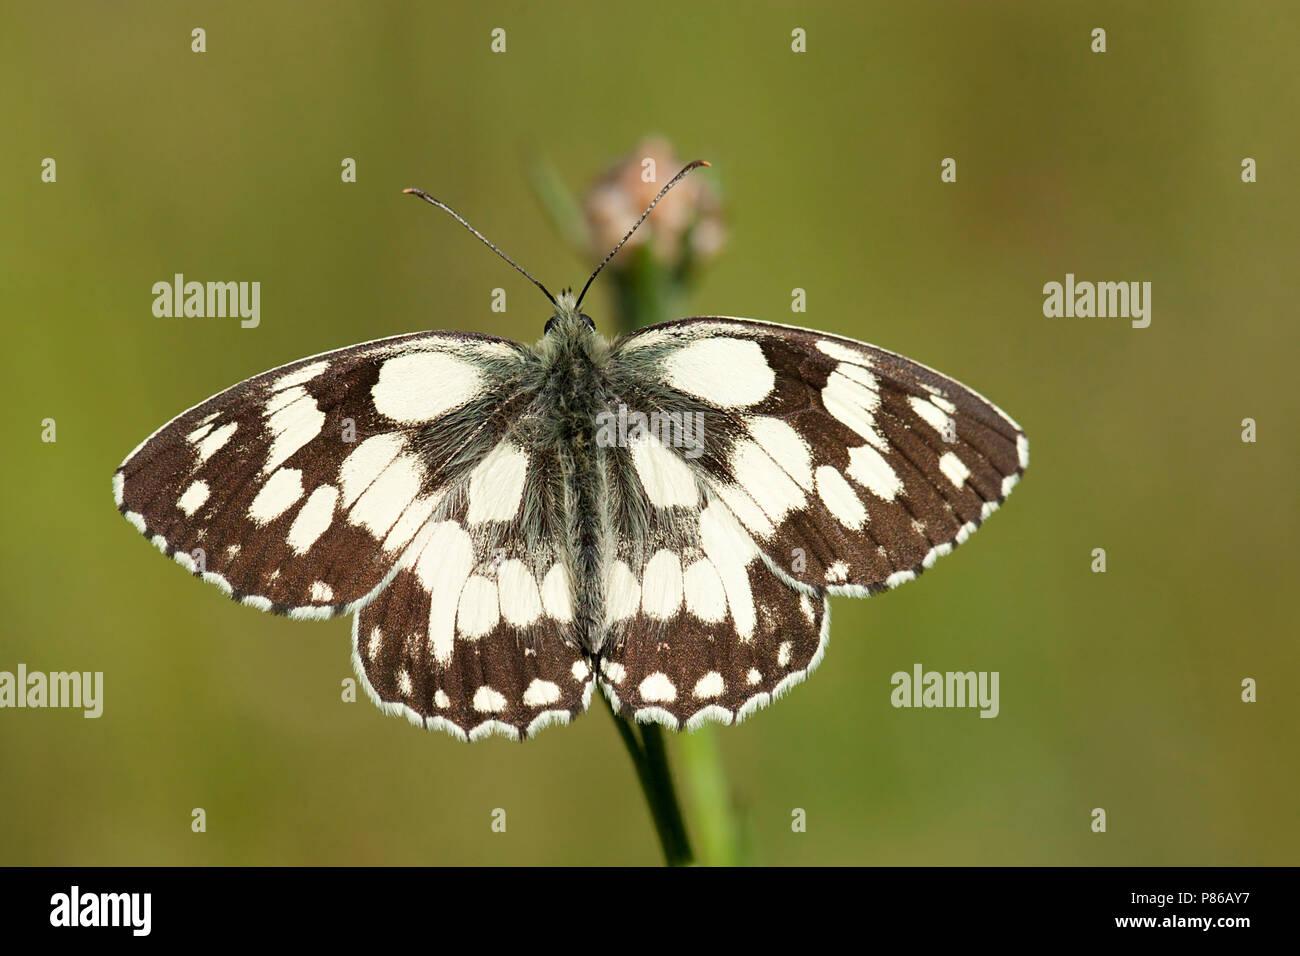 Dambordje / Marbled white (Melanargia galathea) - Stock Image